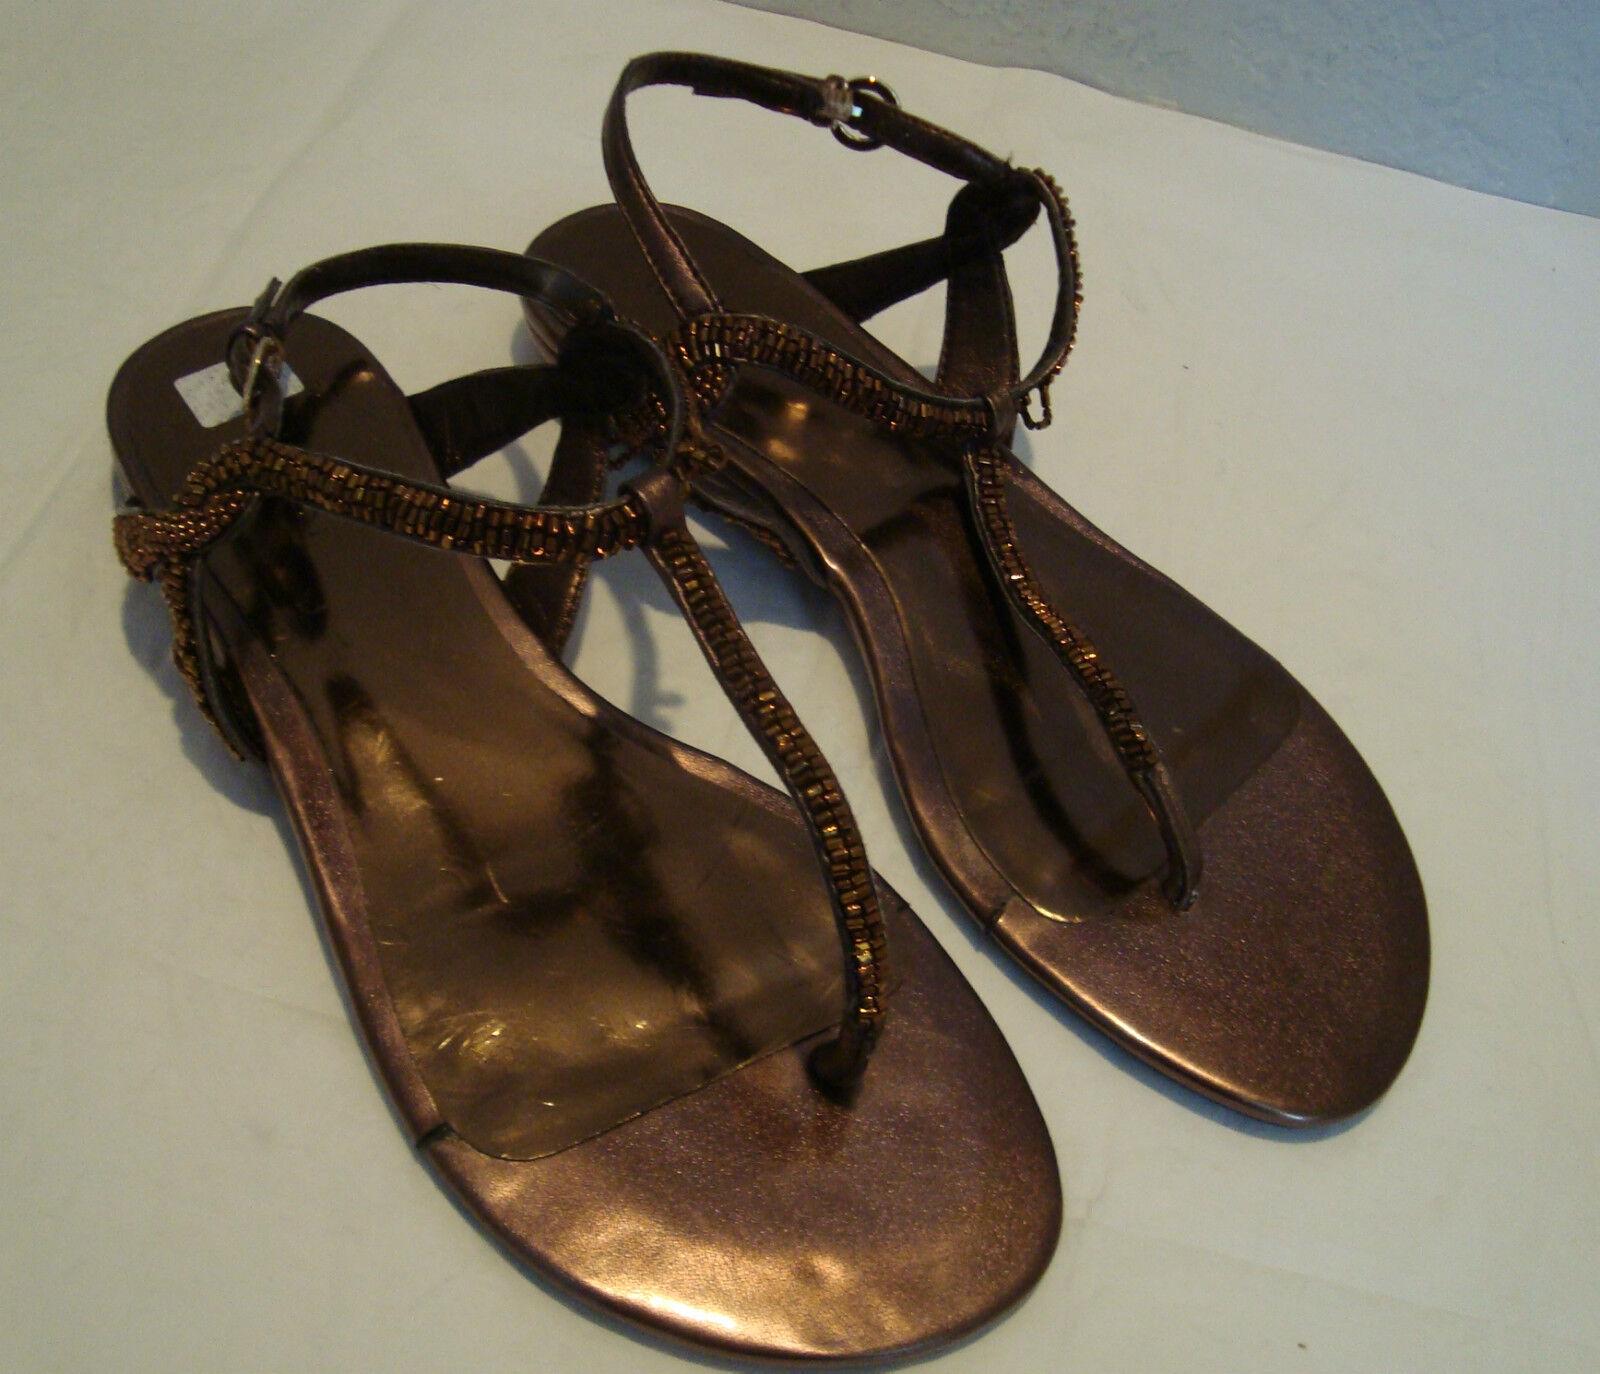 Nine West Damenschuhe Angiola Bronze Sandales Schuhes 8 Medium Display Model